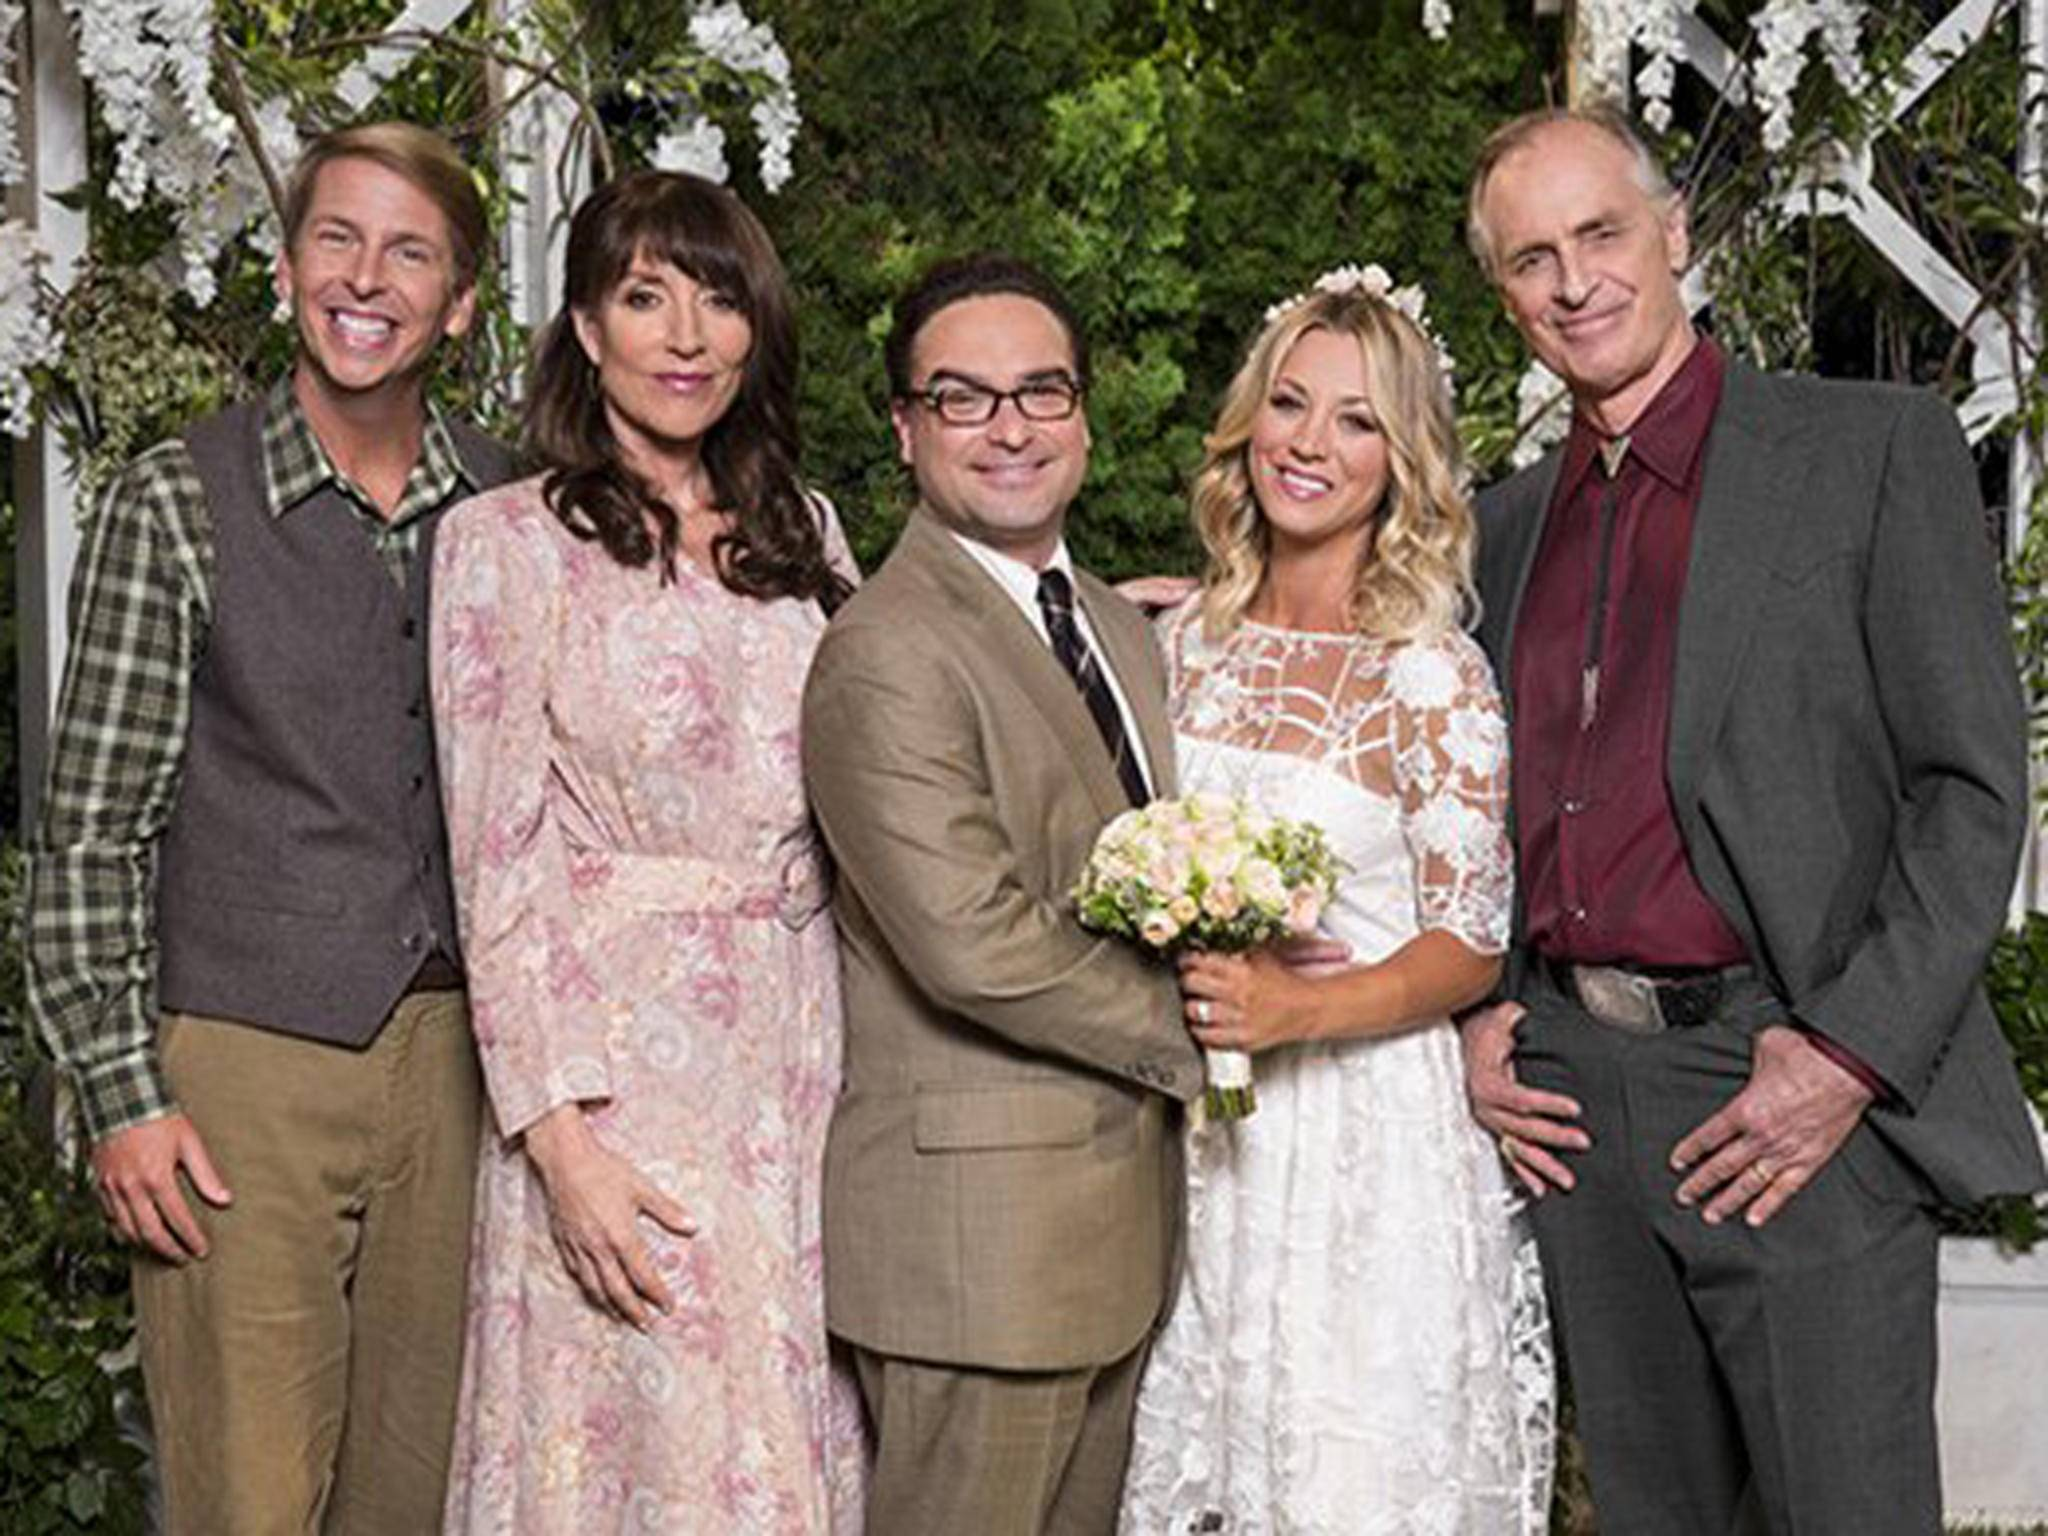 In Staffel 10 sehen wir unter anderem Pennys Familie.